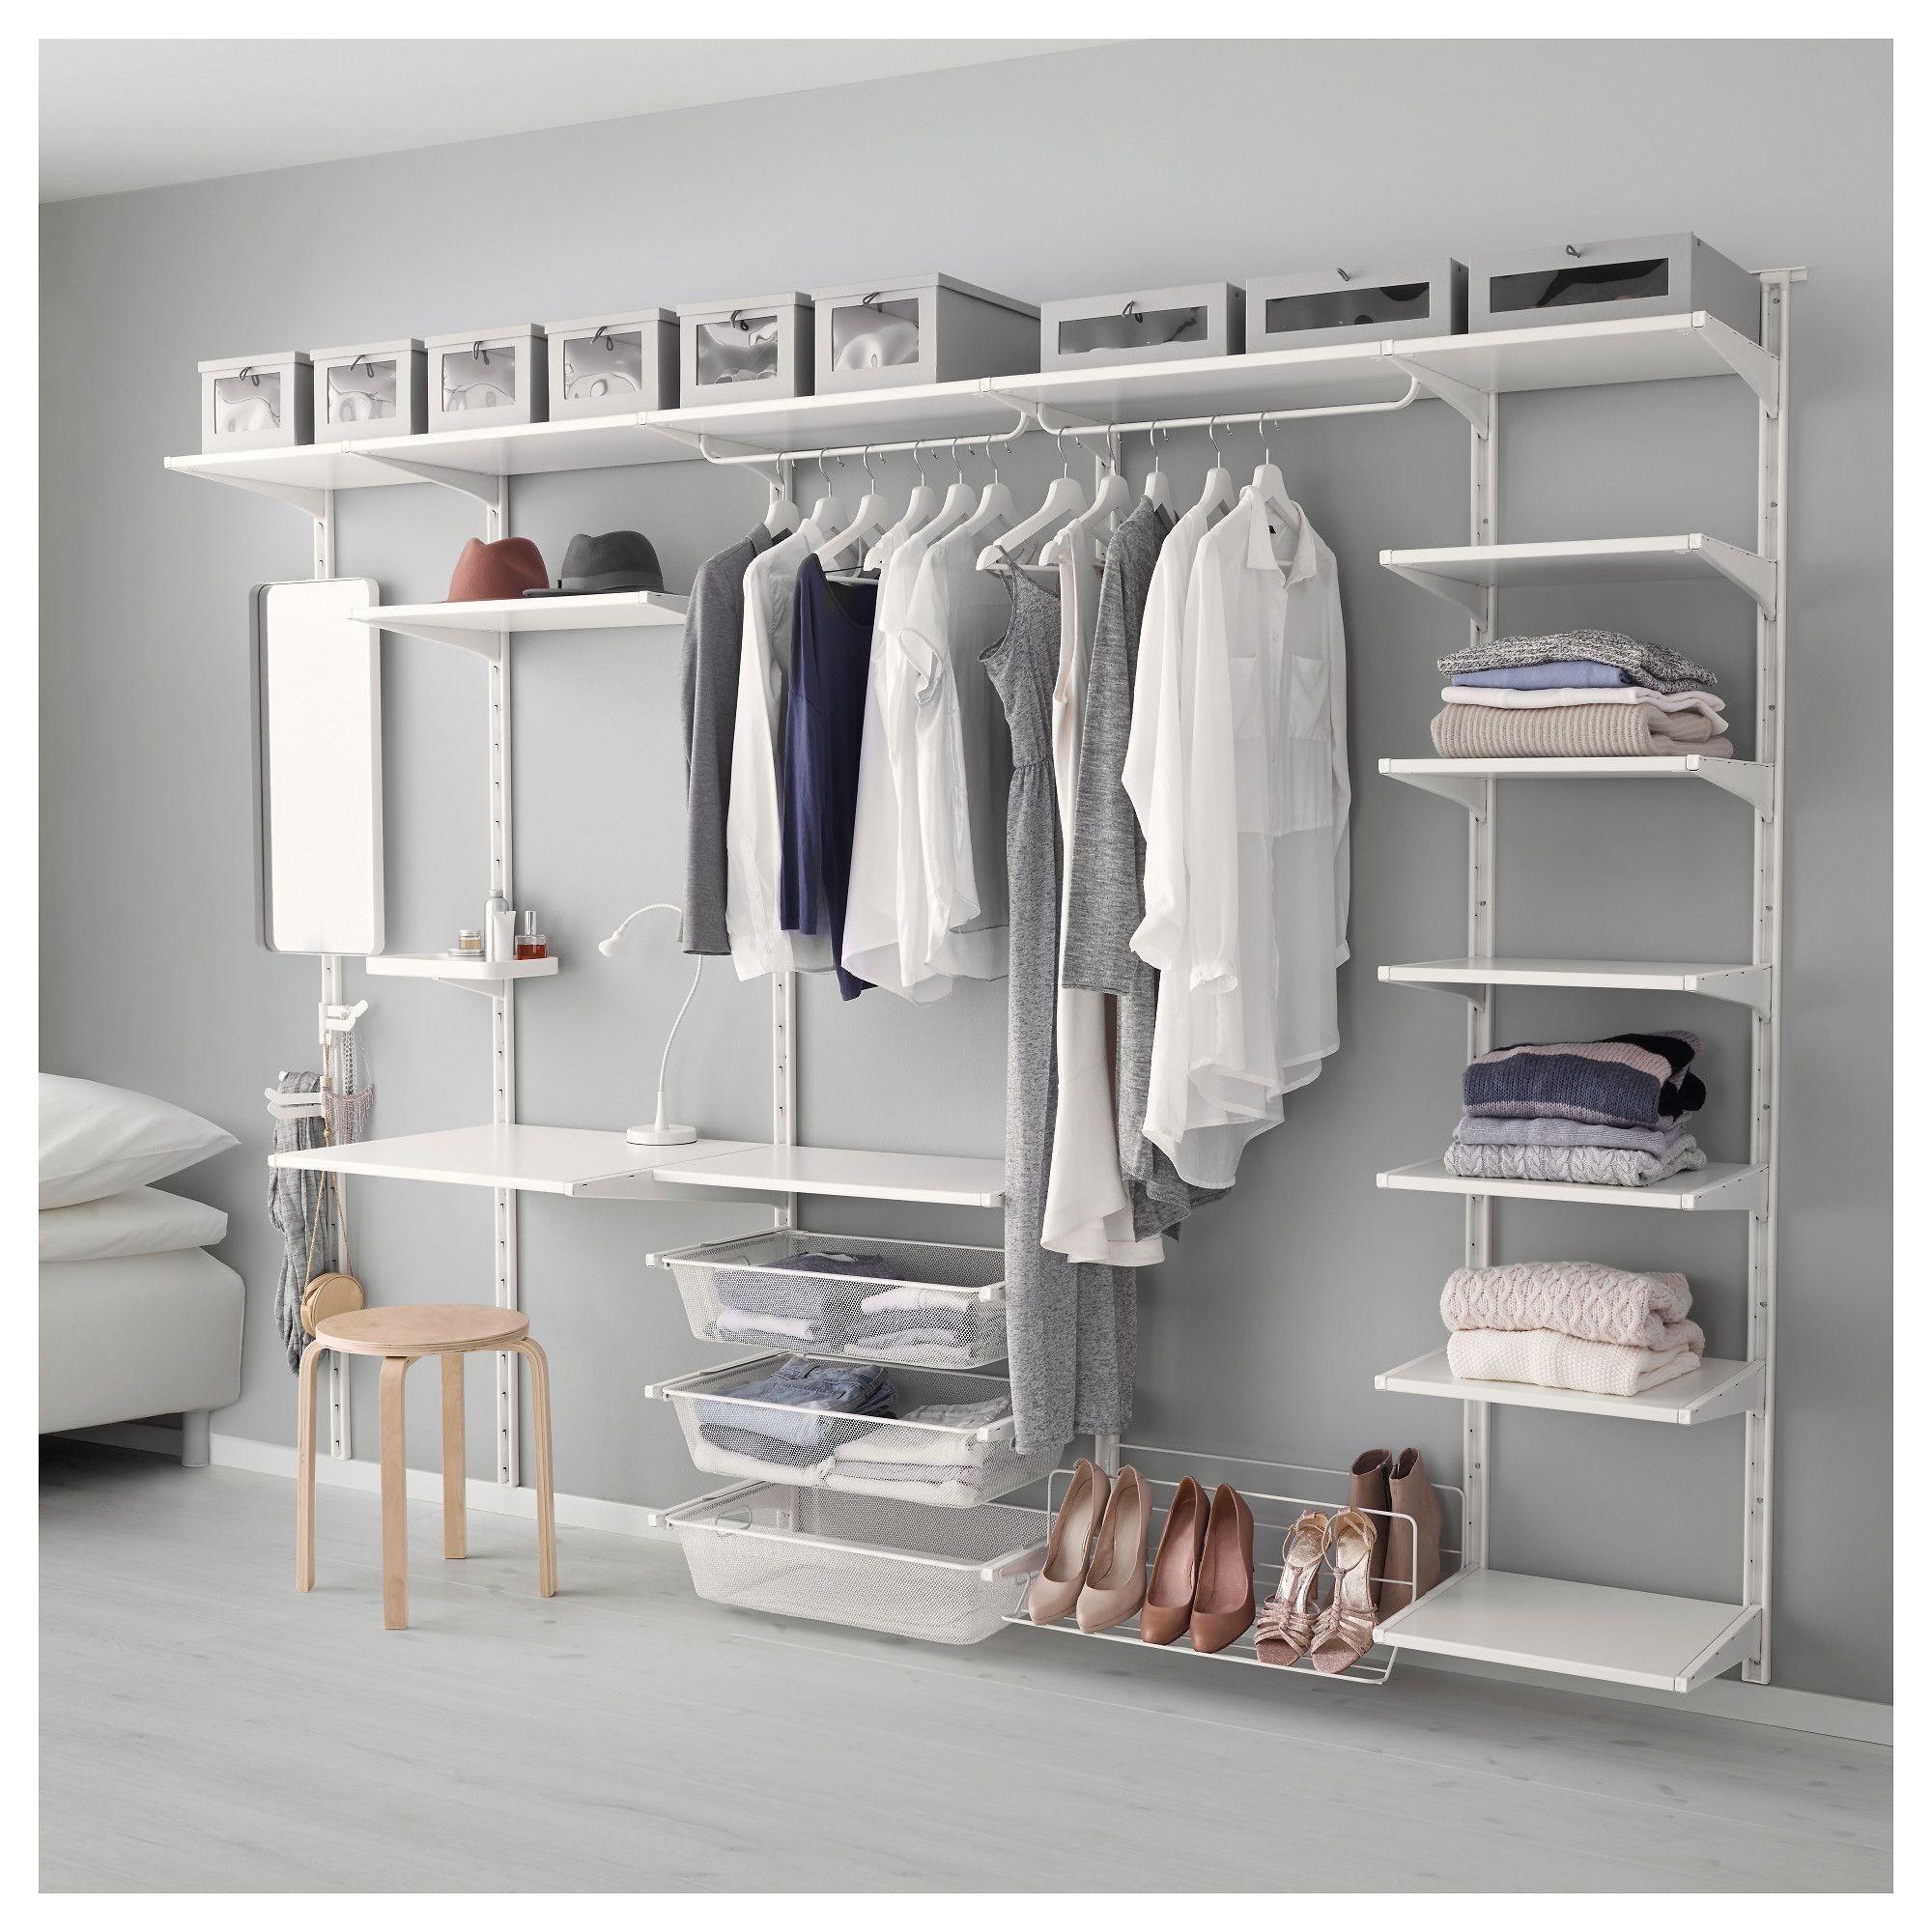 Closetmaid Shoe Rack Lowes Home Design Lowes Closet Maid Lovely Wardrobe  Storage Closet